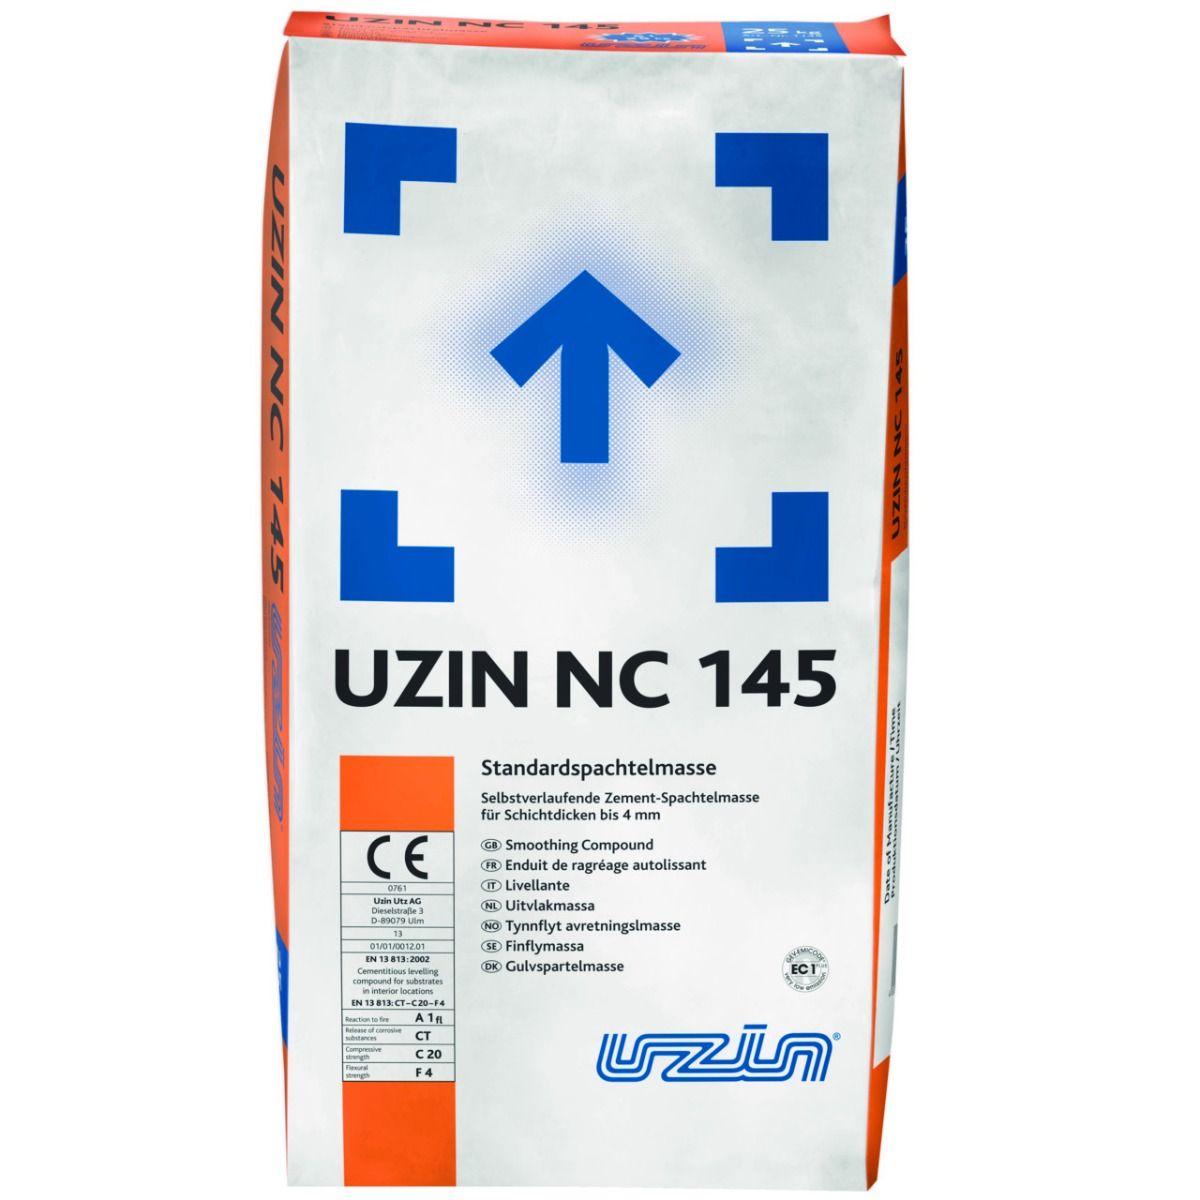 Uzin NC 145 Spachtelmasse 25kg